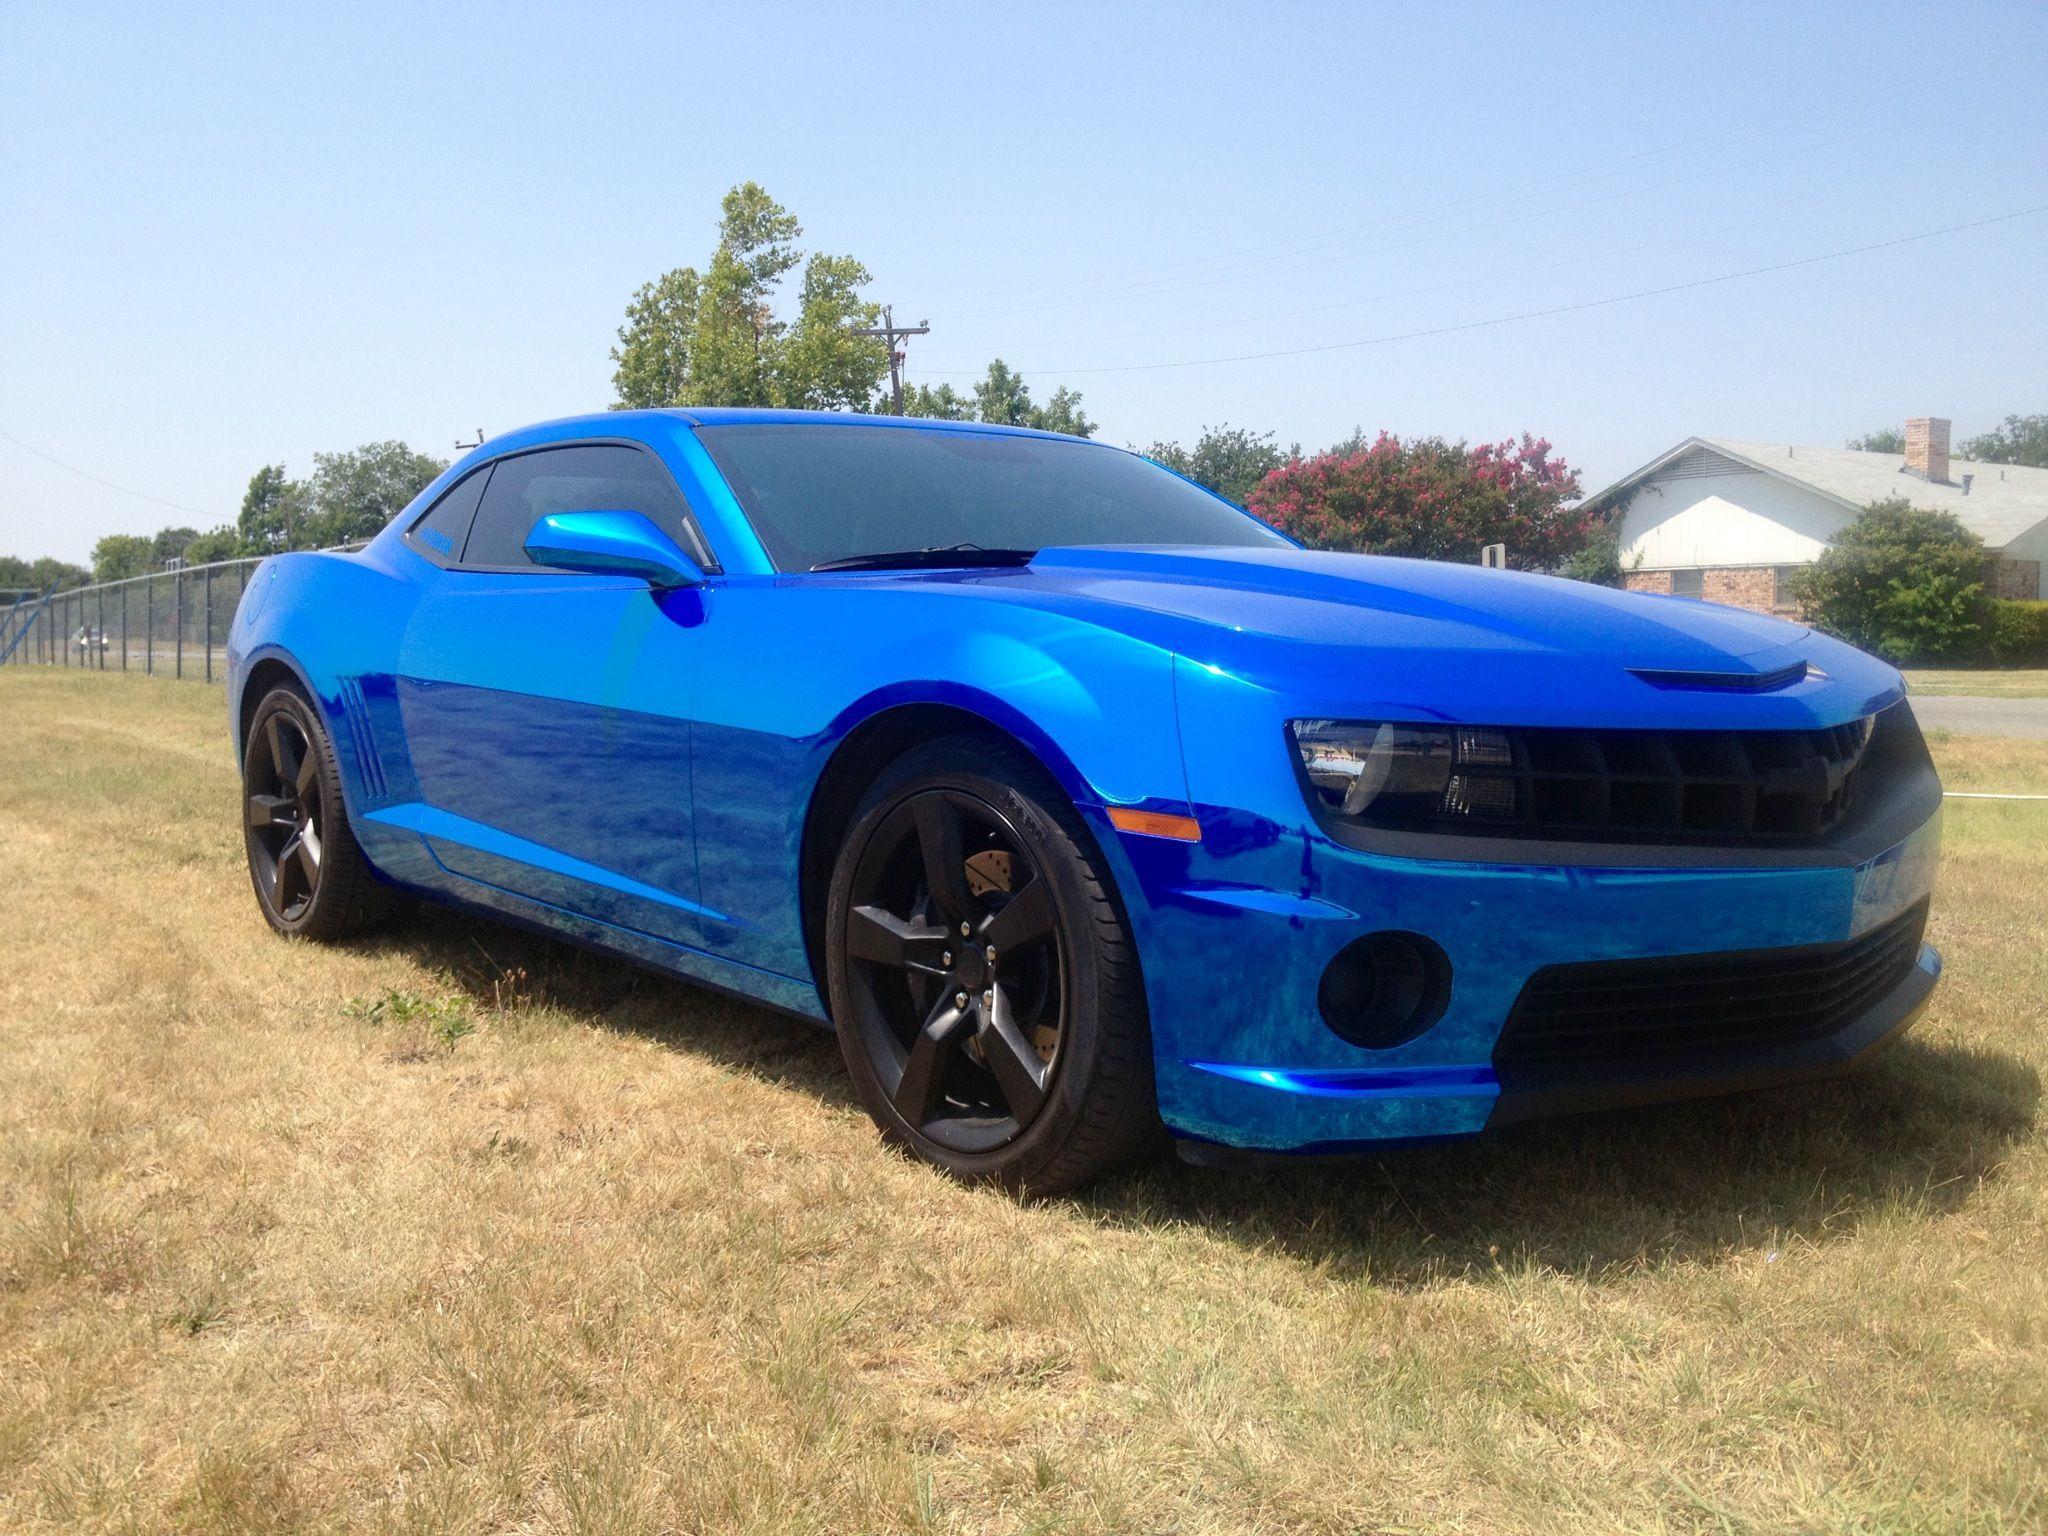 Chrome Blue With Plasti Dipped Rims Car Gadgets Bmw Car Im Blue